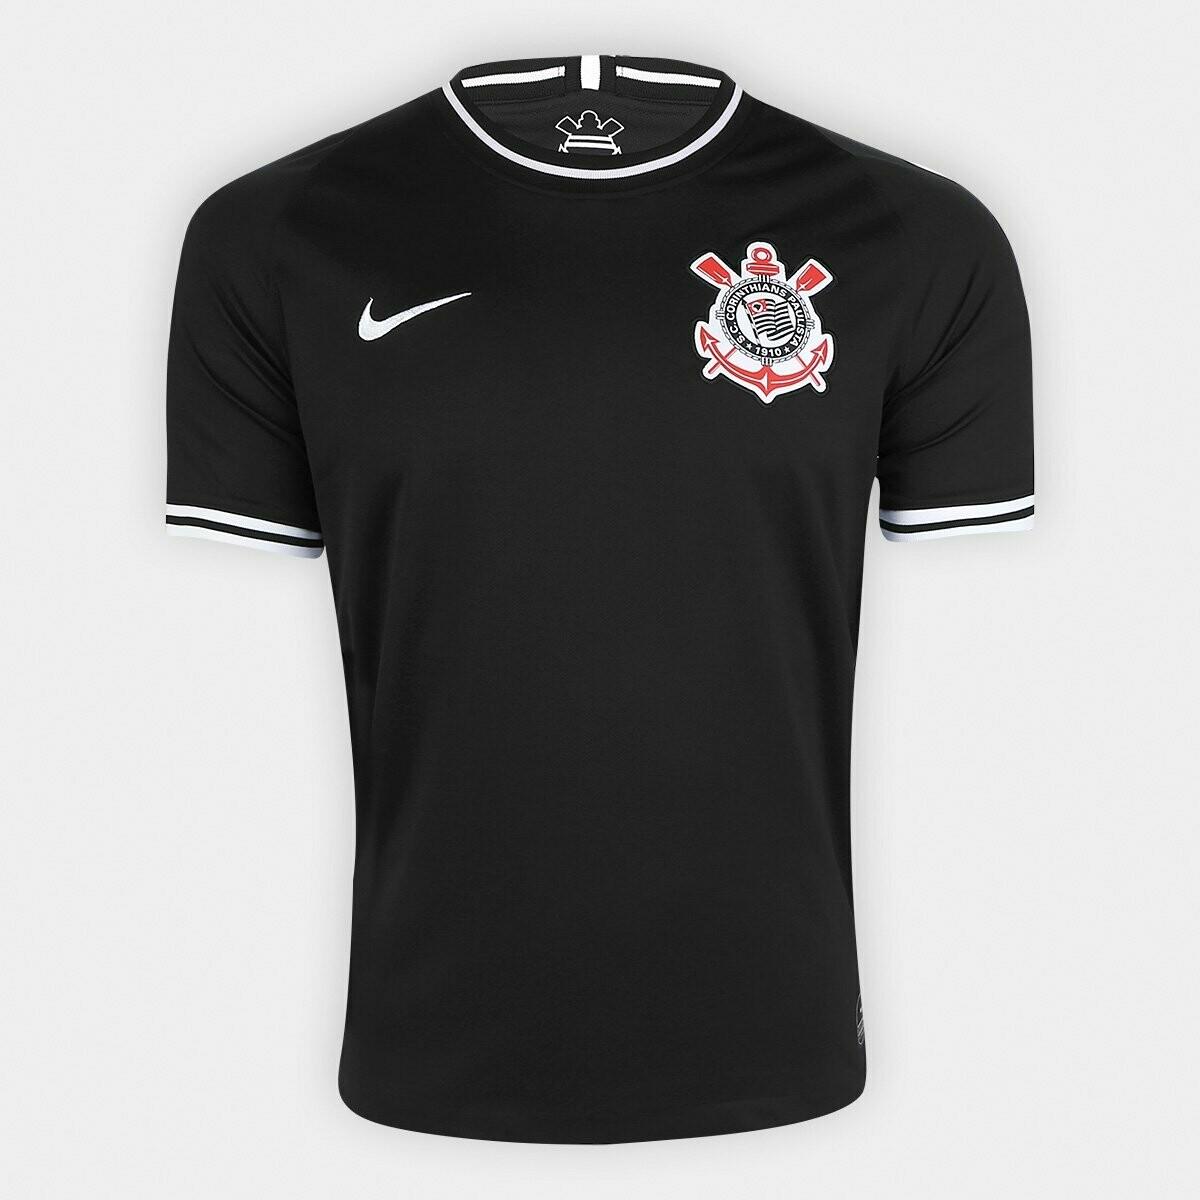 Camisa Corinthians II 19/20  Torcedor Nike Masculina - Preto e Branco